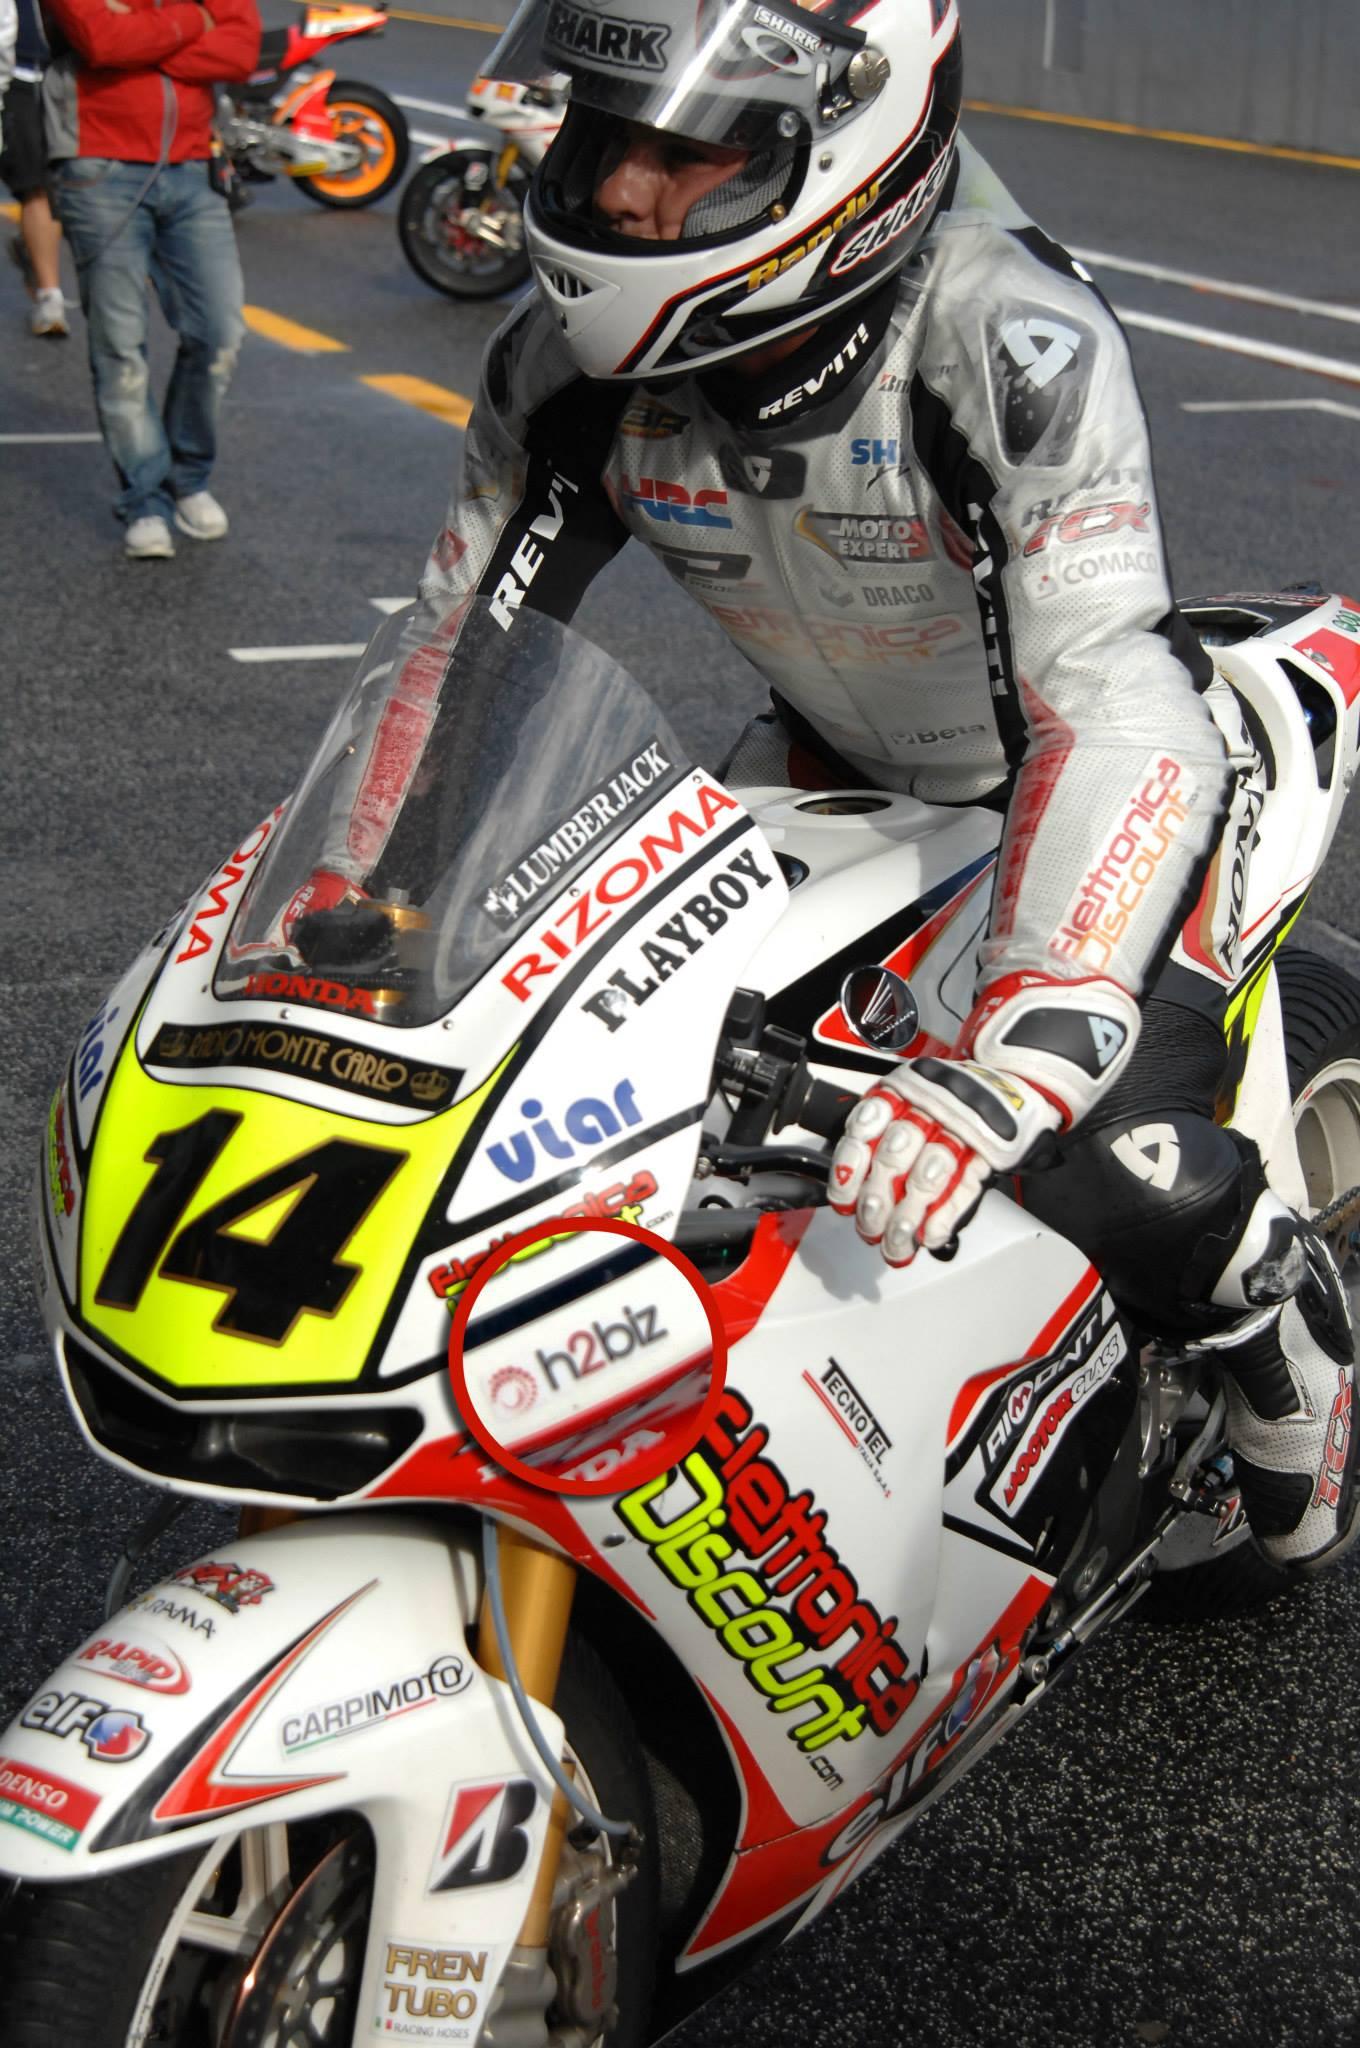 H2biz MotoGP - Estoril